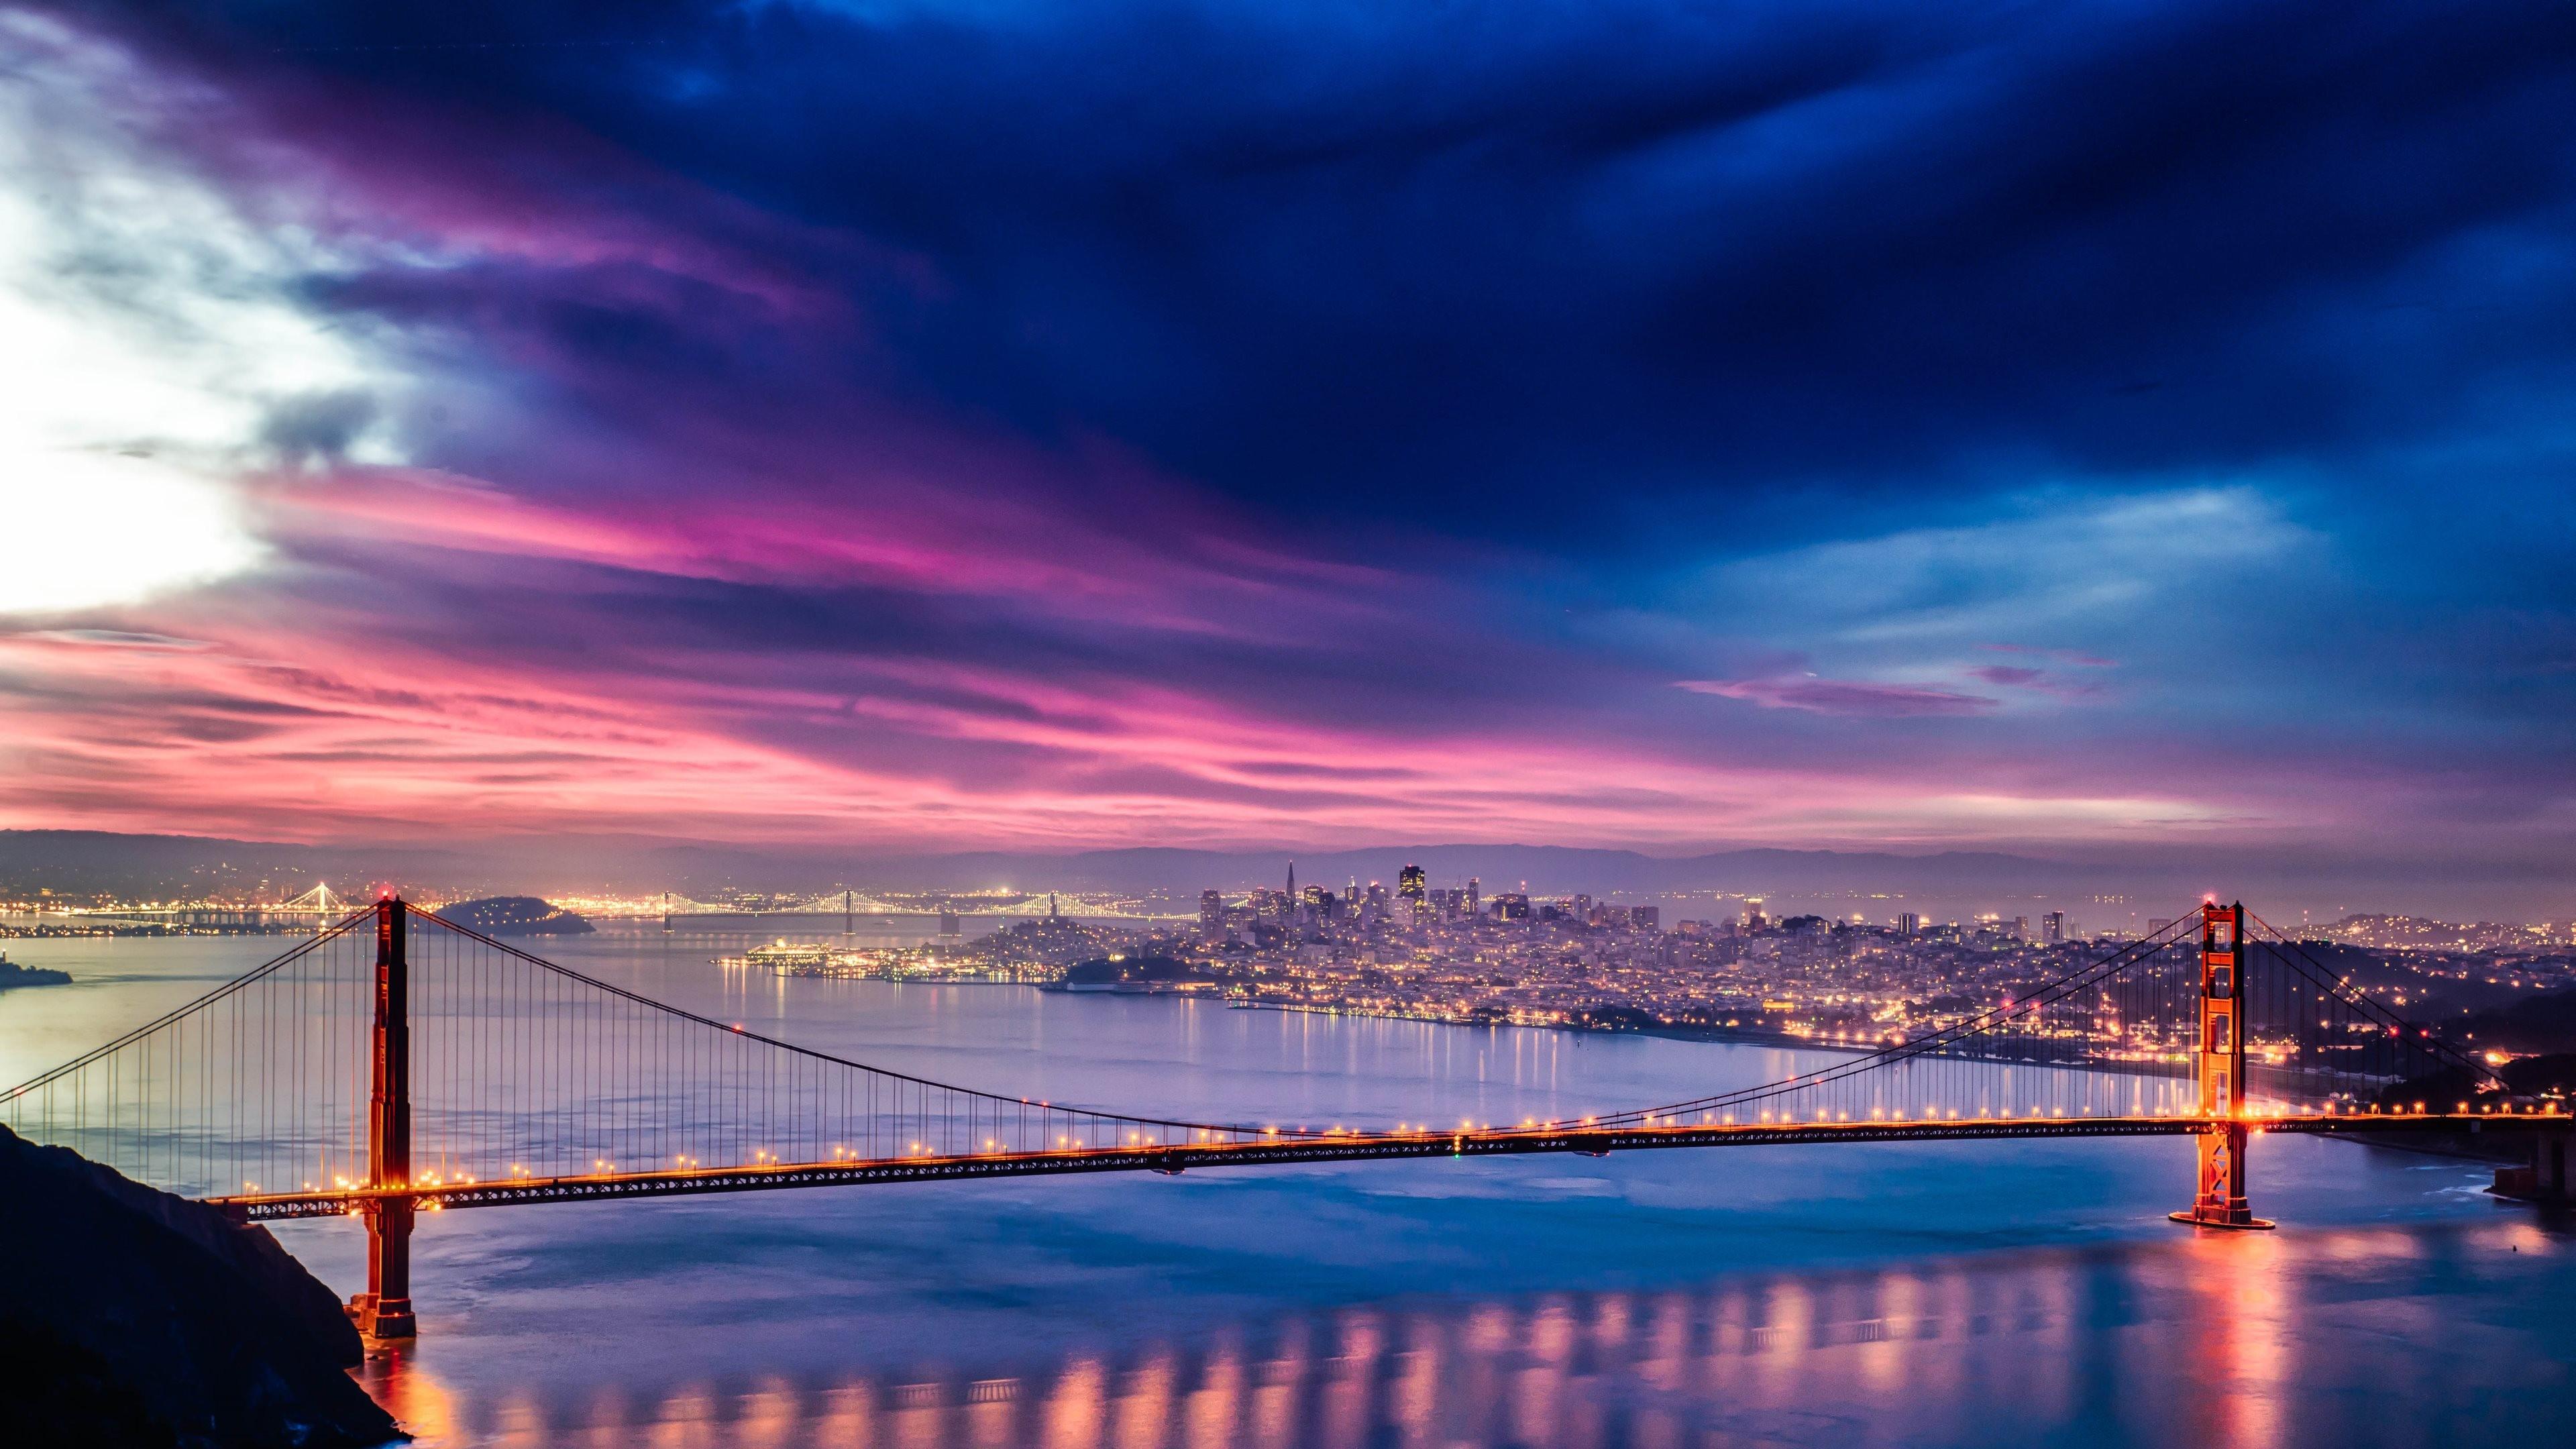 Evening Crossing, Bay Bridge, San Francisco, California  № 3721017  скачать